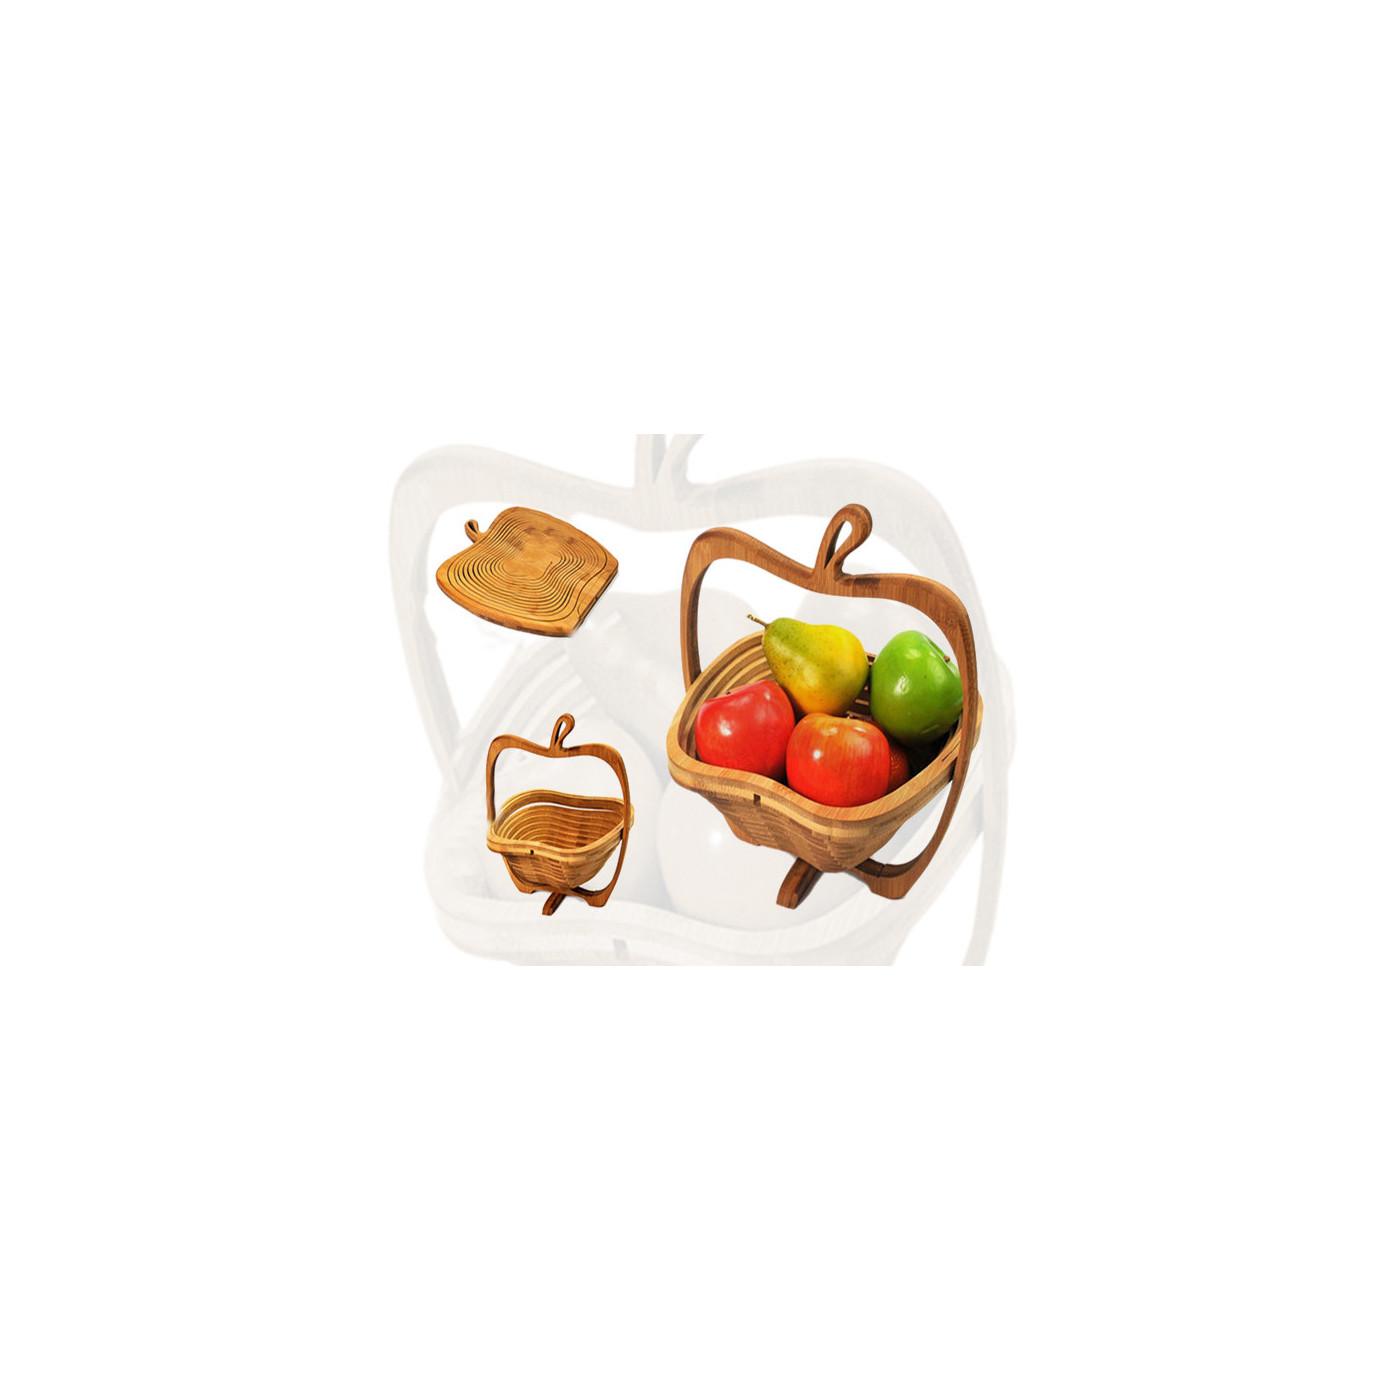 Deco wooden fruit basket (foldable)